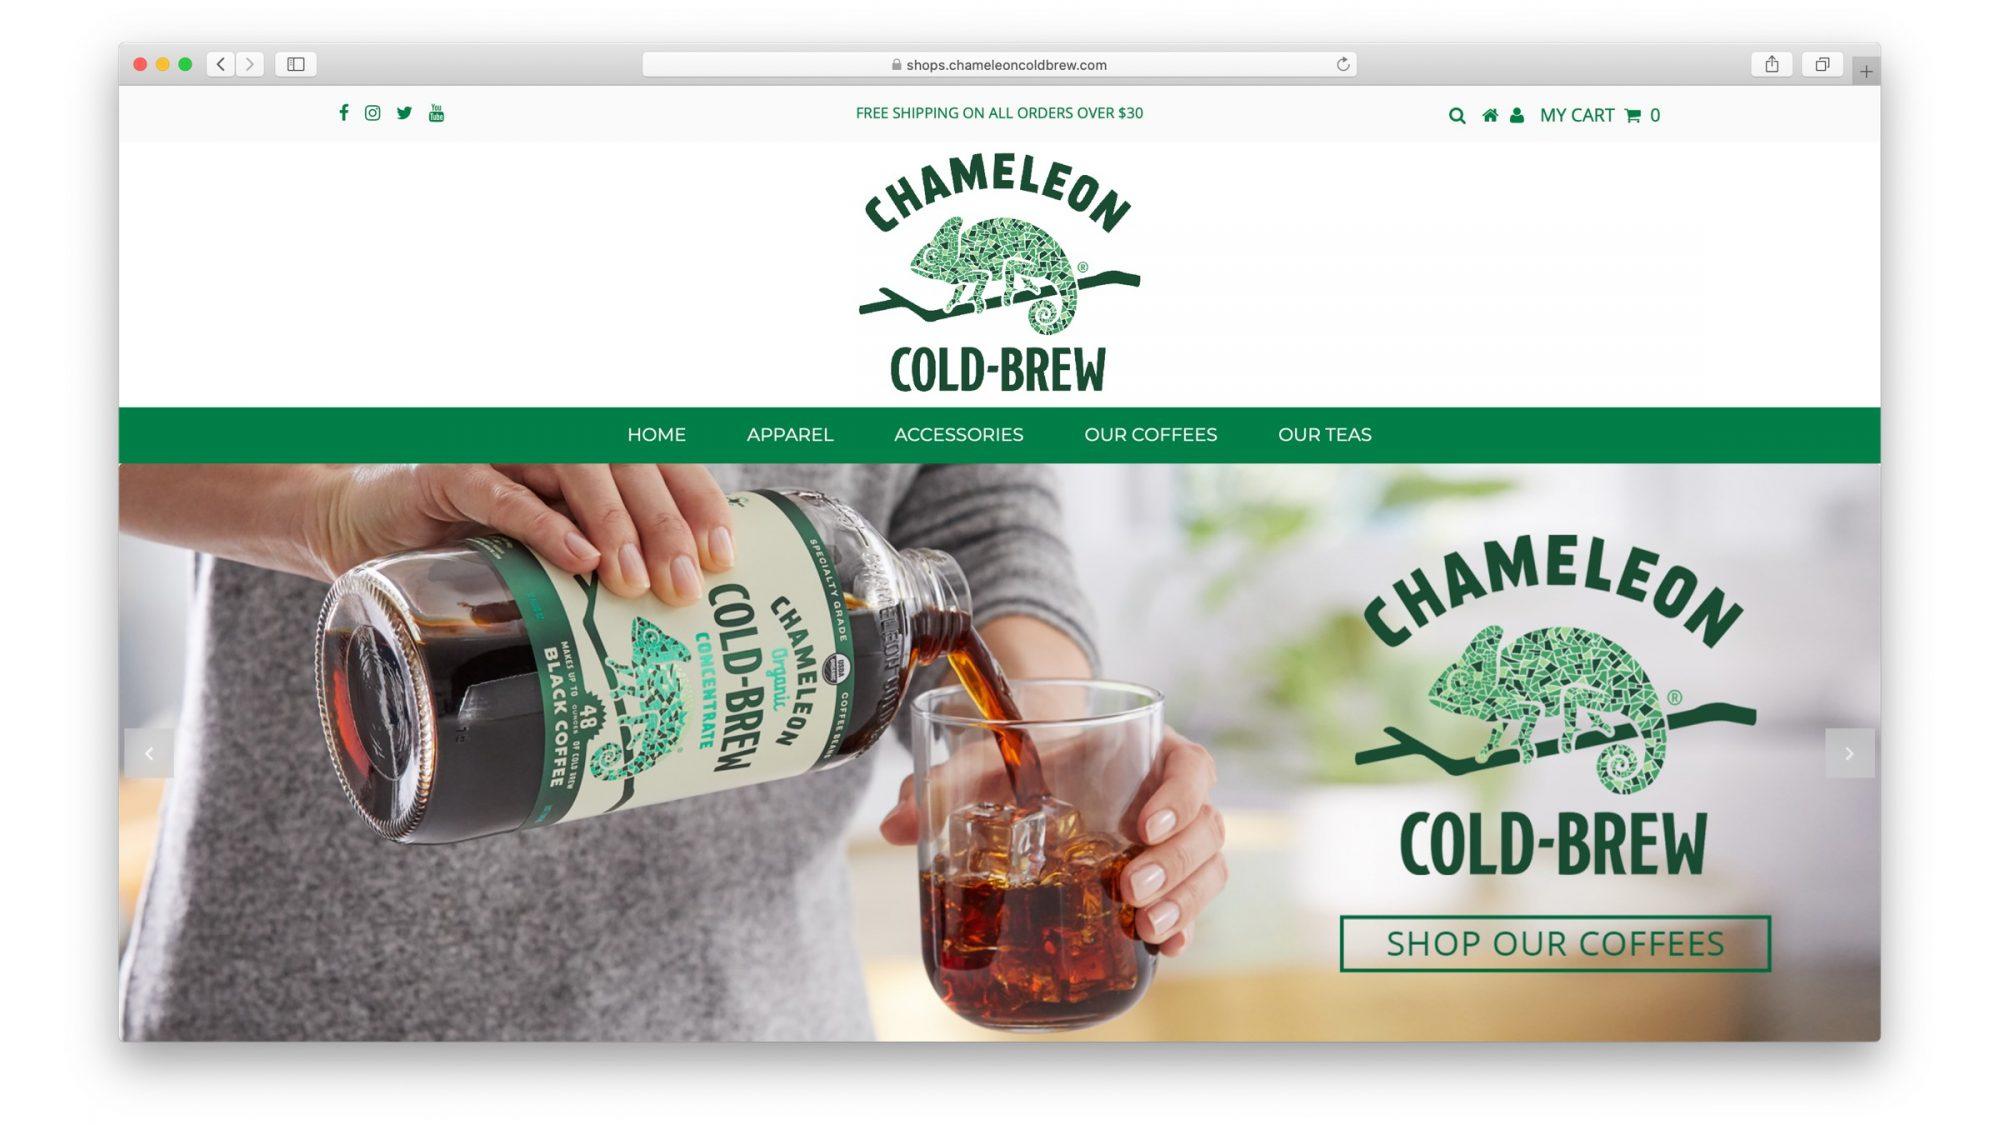 Chameleon Cold Brew DTC